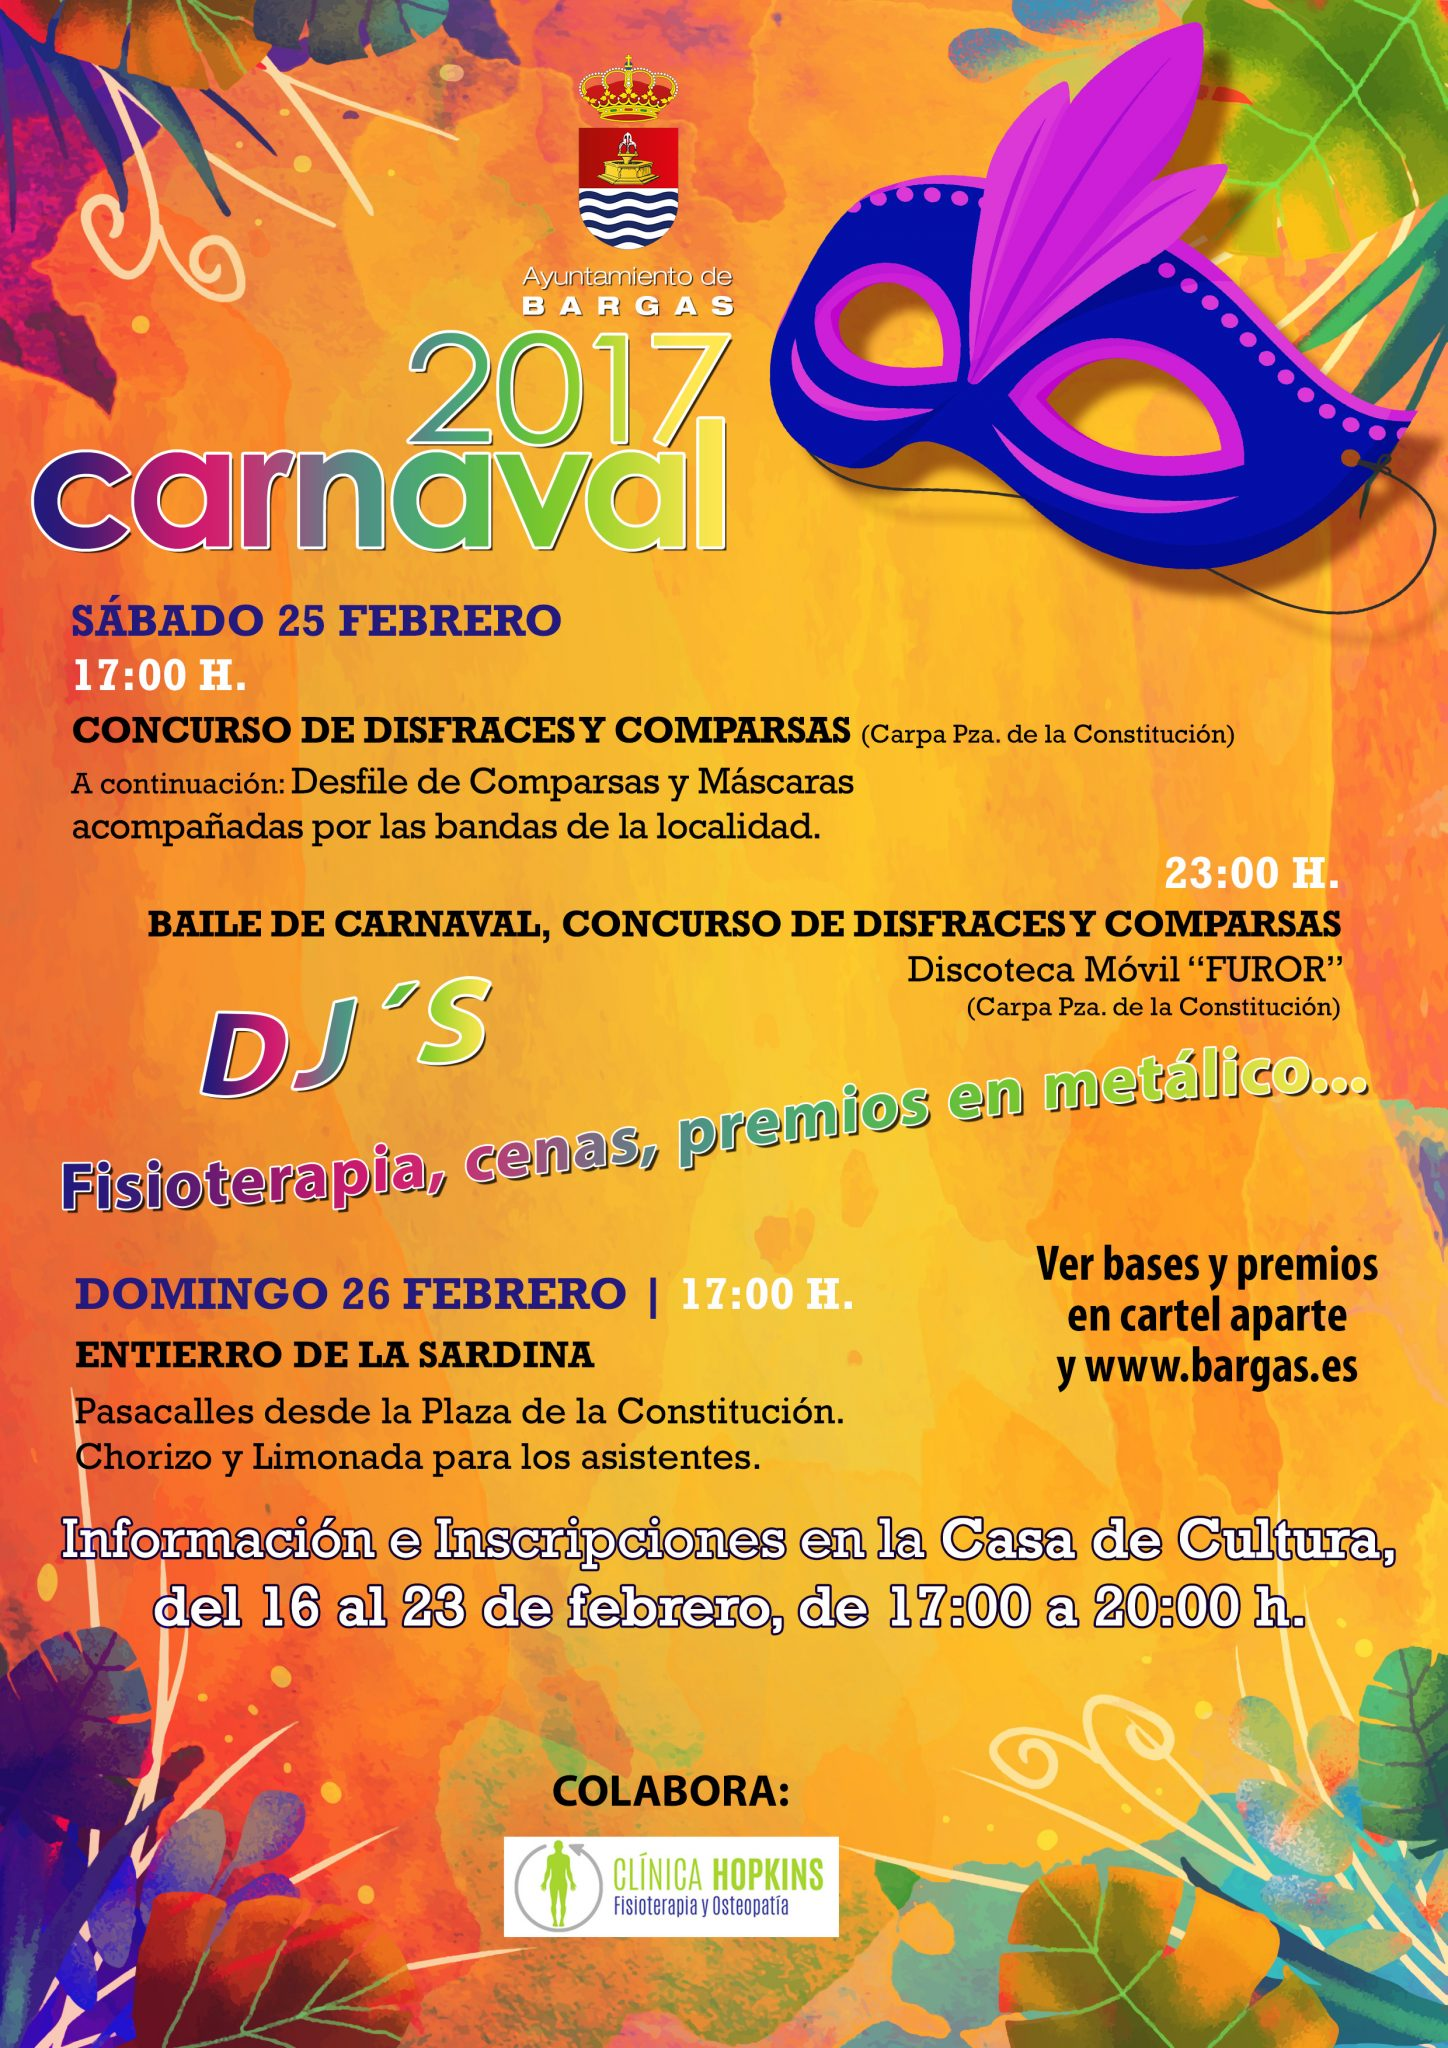 Carnaval 2017 – Bases